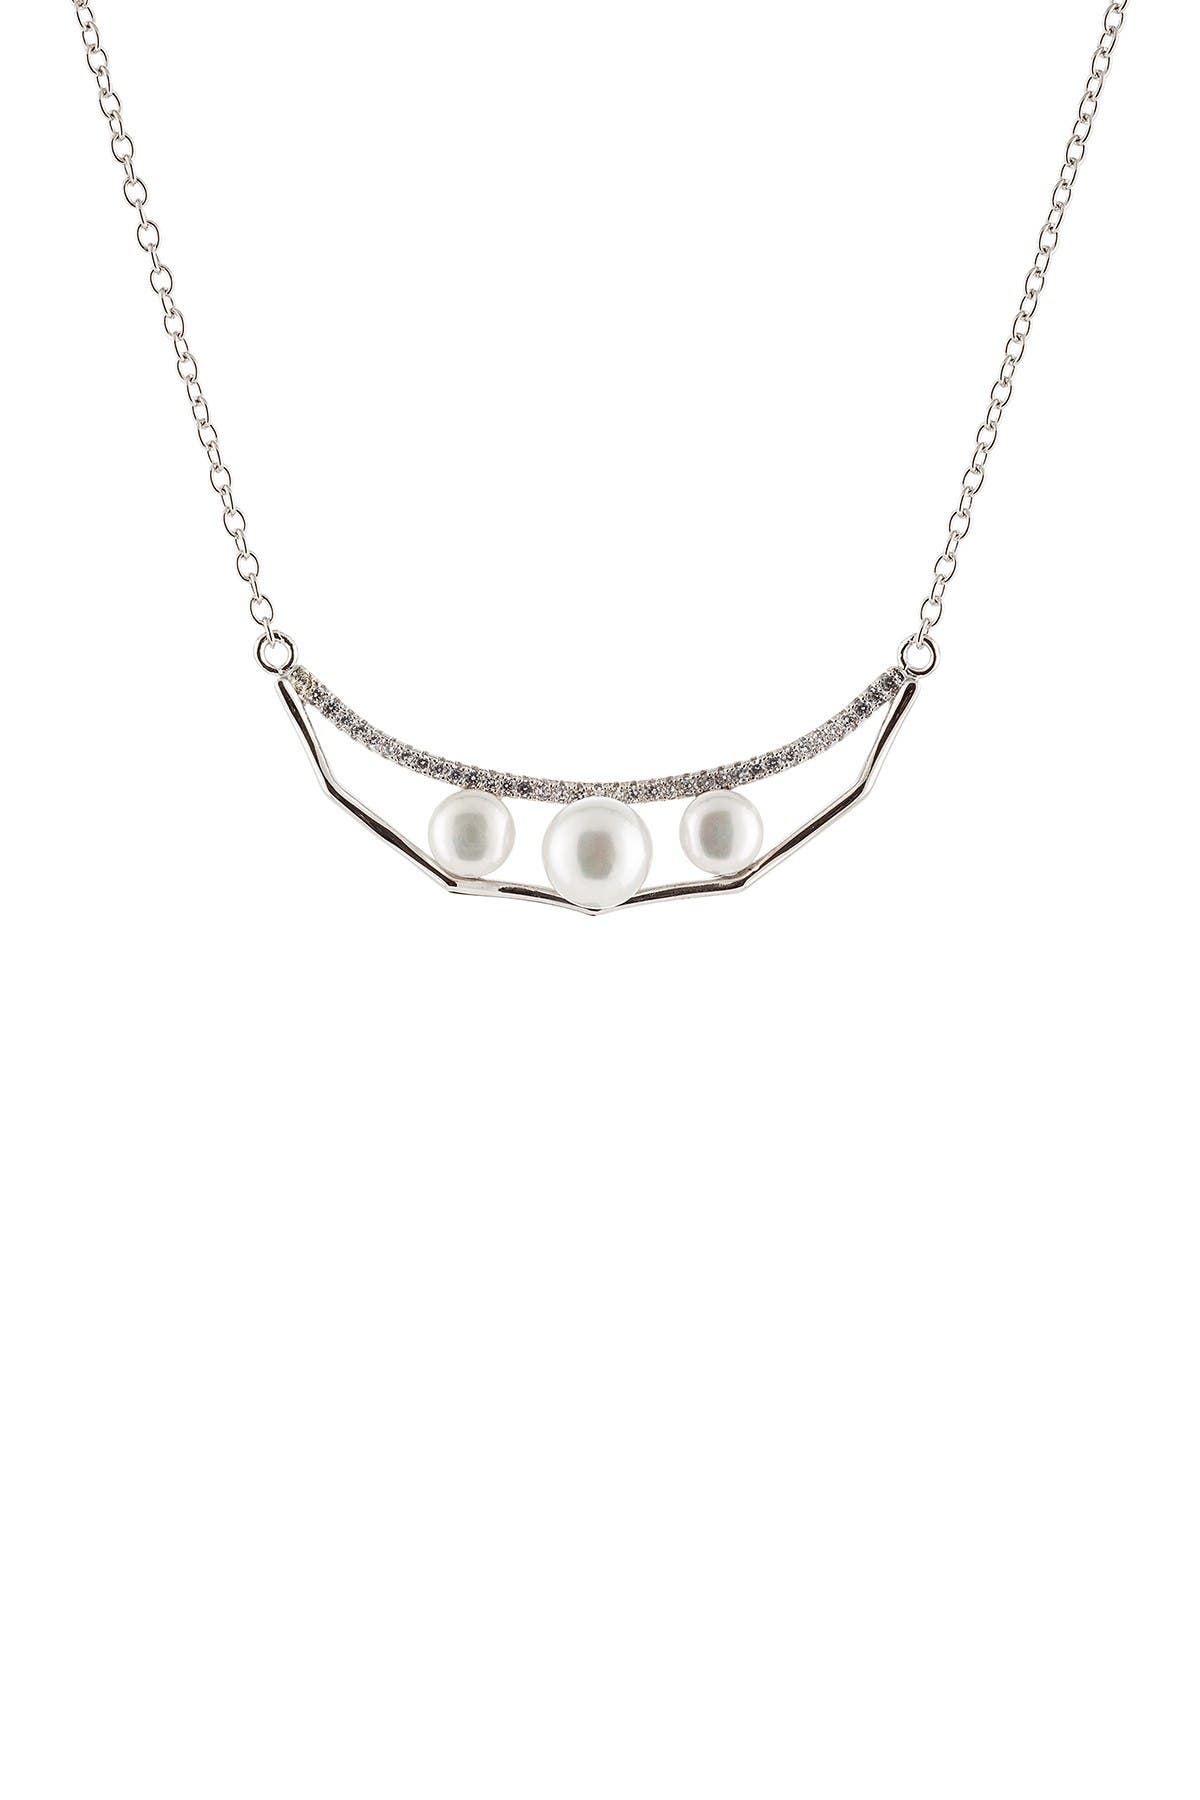 Image of Splendid Pearls 2-Piece 7-8mm Freshwater Pearl Necklace & Earrings Set